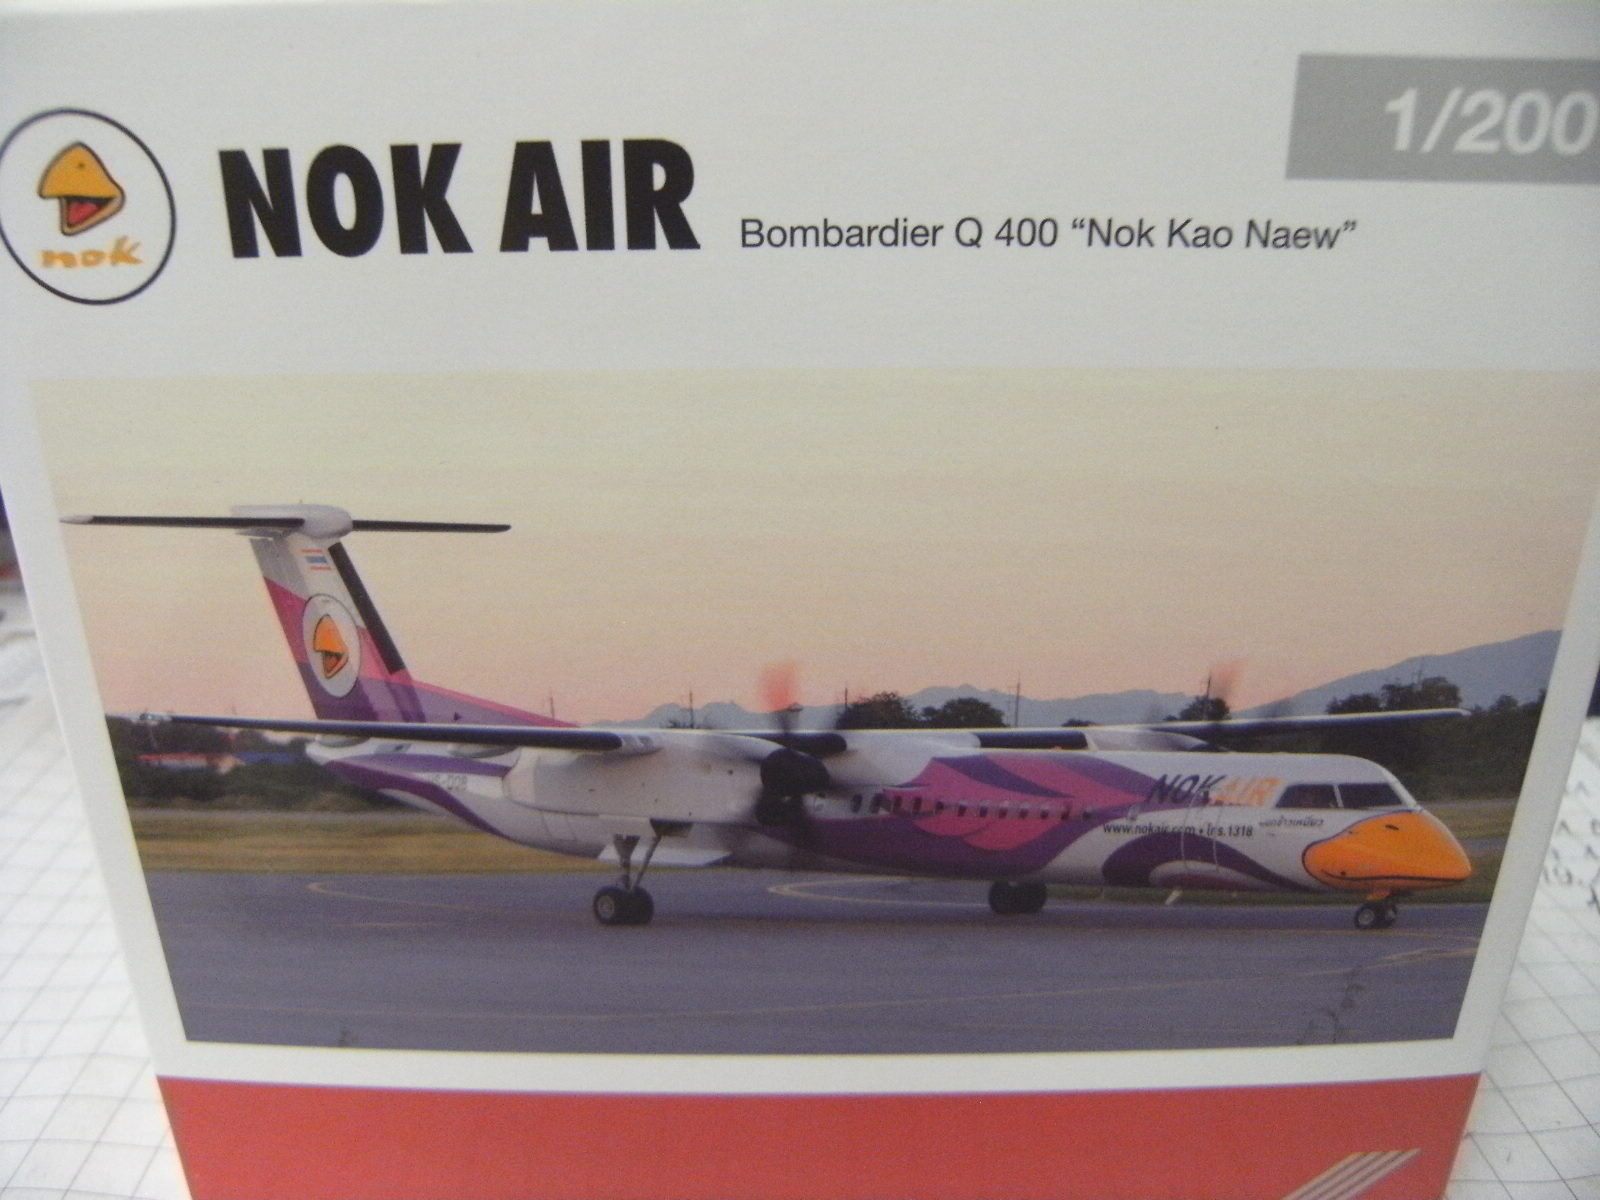 Herpa 1 200 558136  Nok Air Bombardier Q400  Nok Kao Neaw  NEU OVP